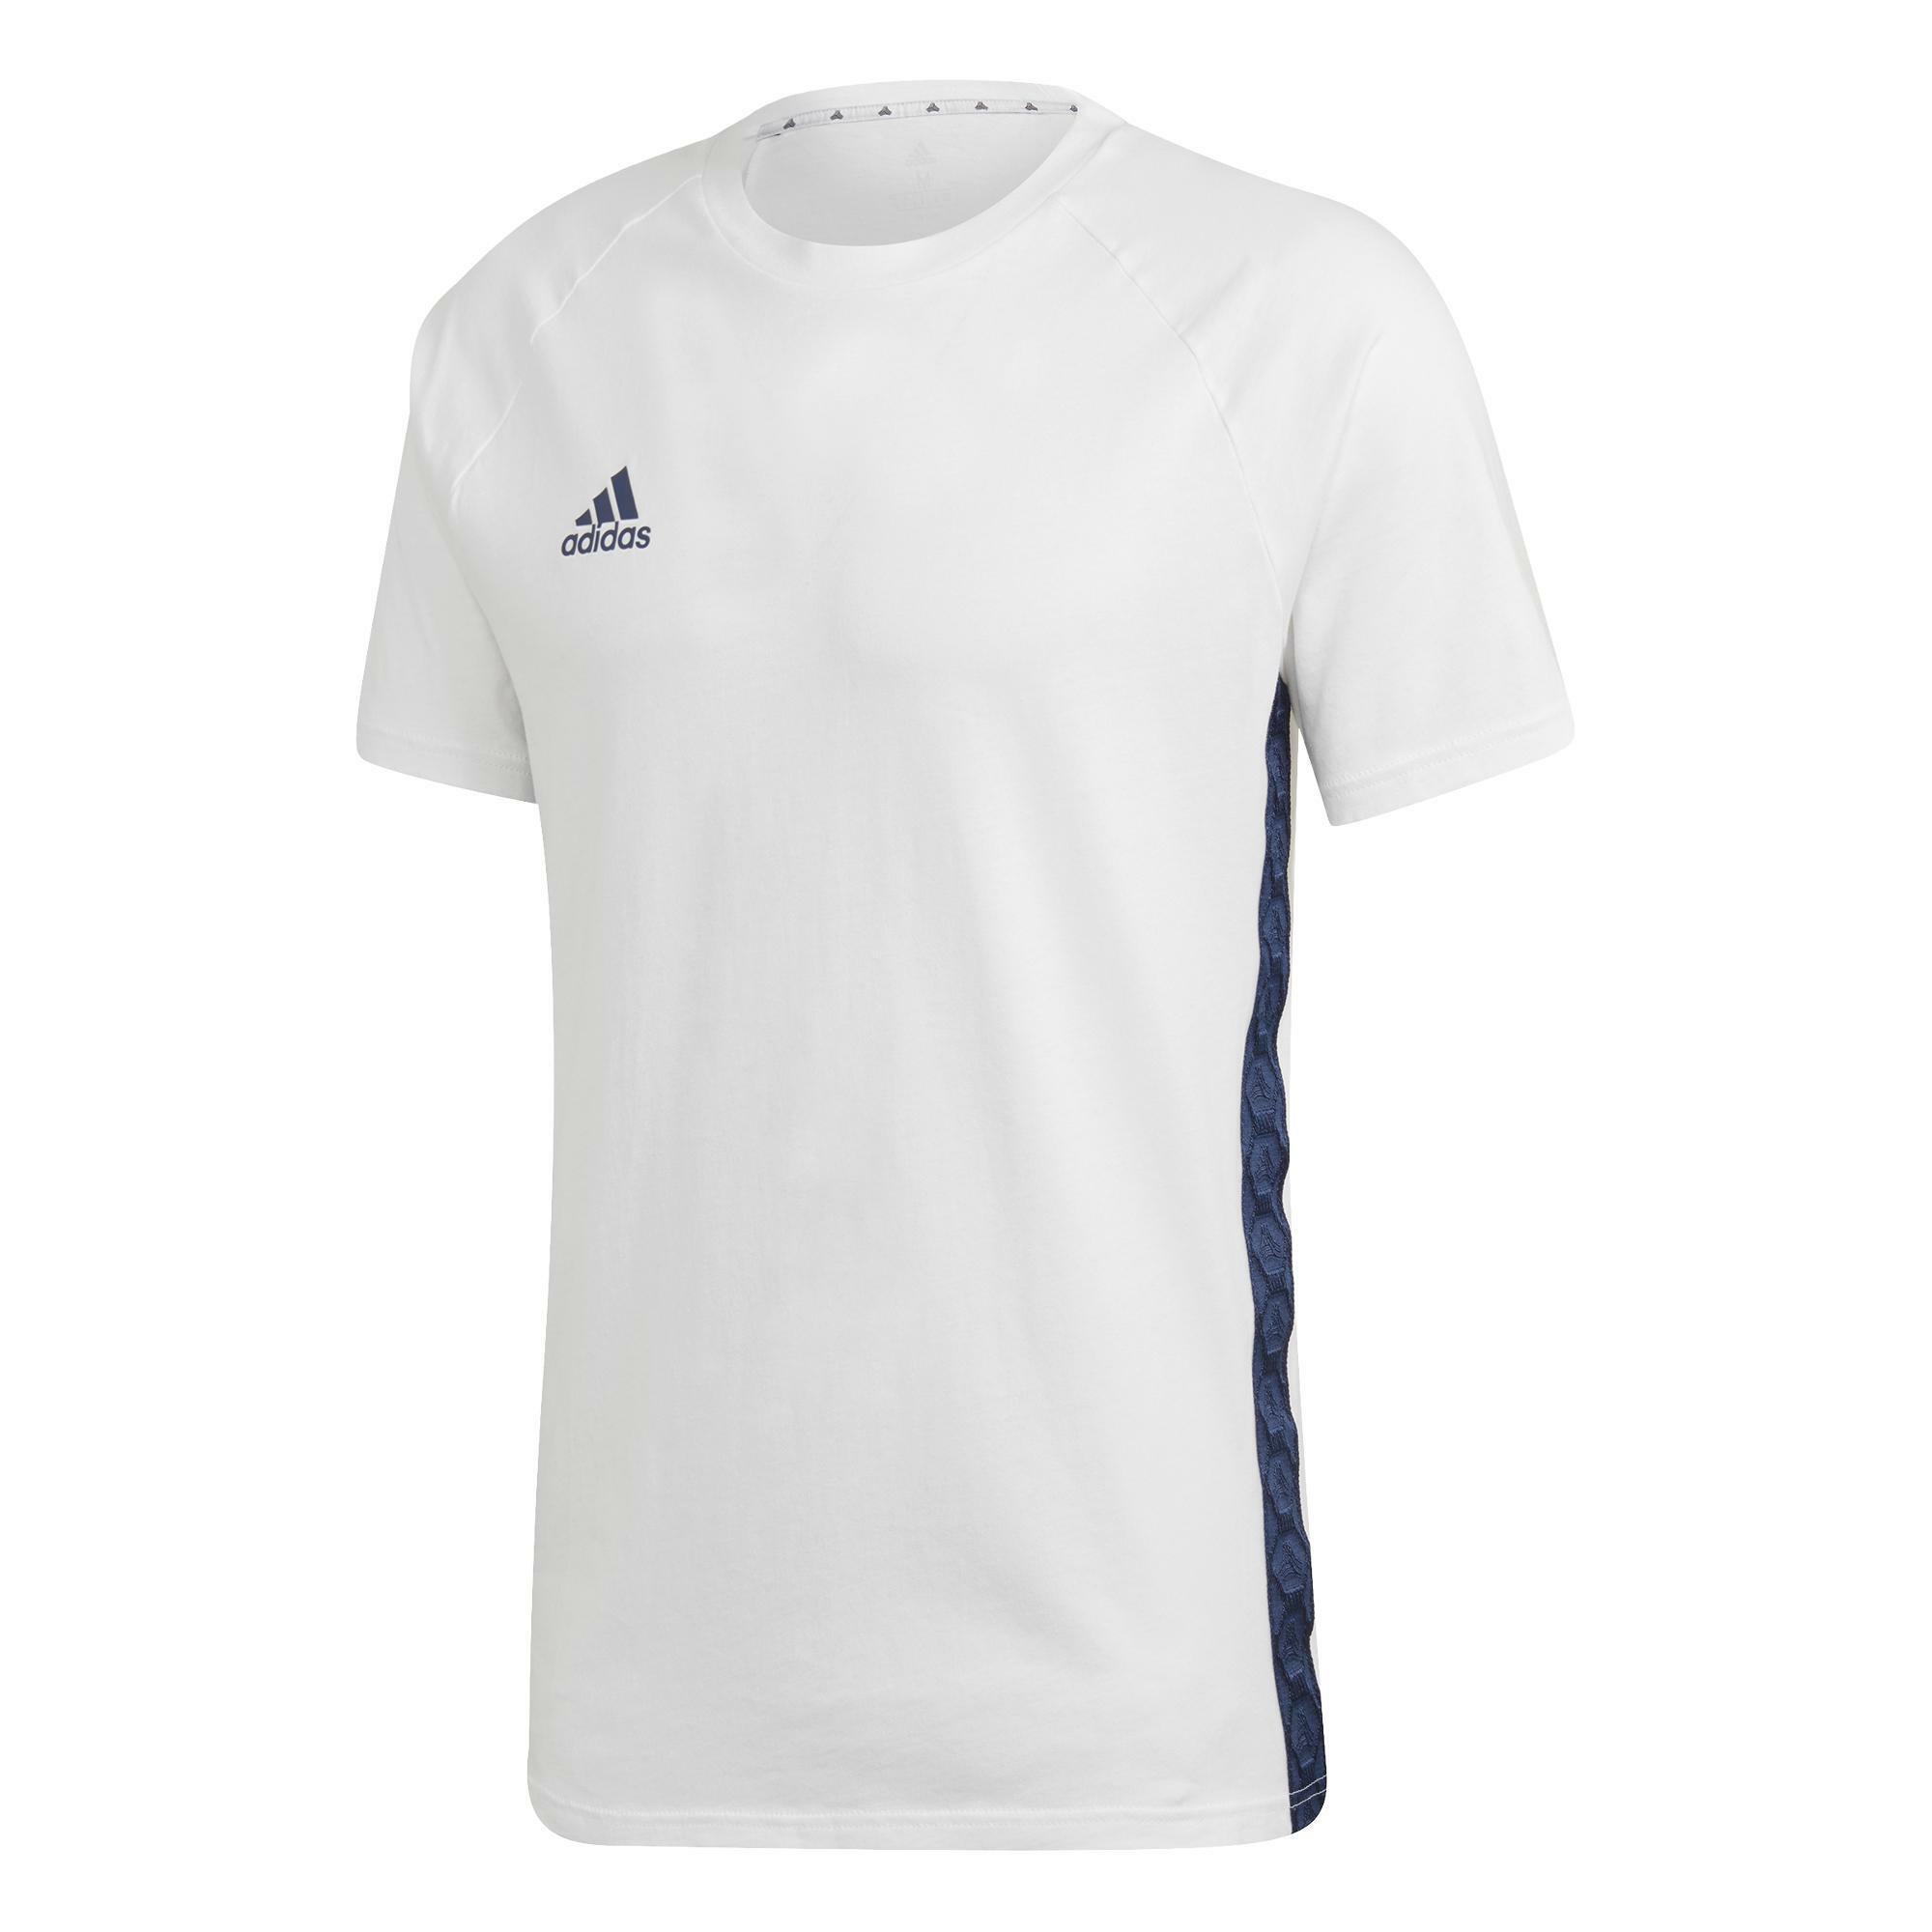 adidas adidas t-shirt calcio tan tape